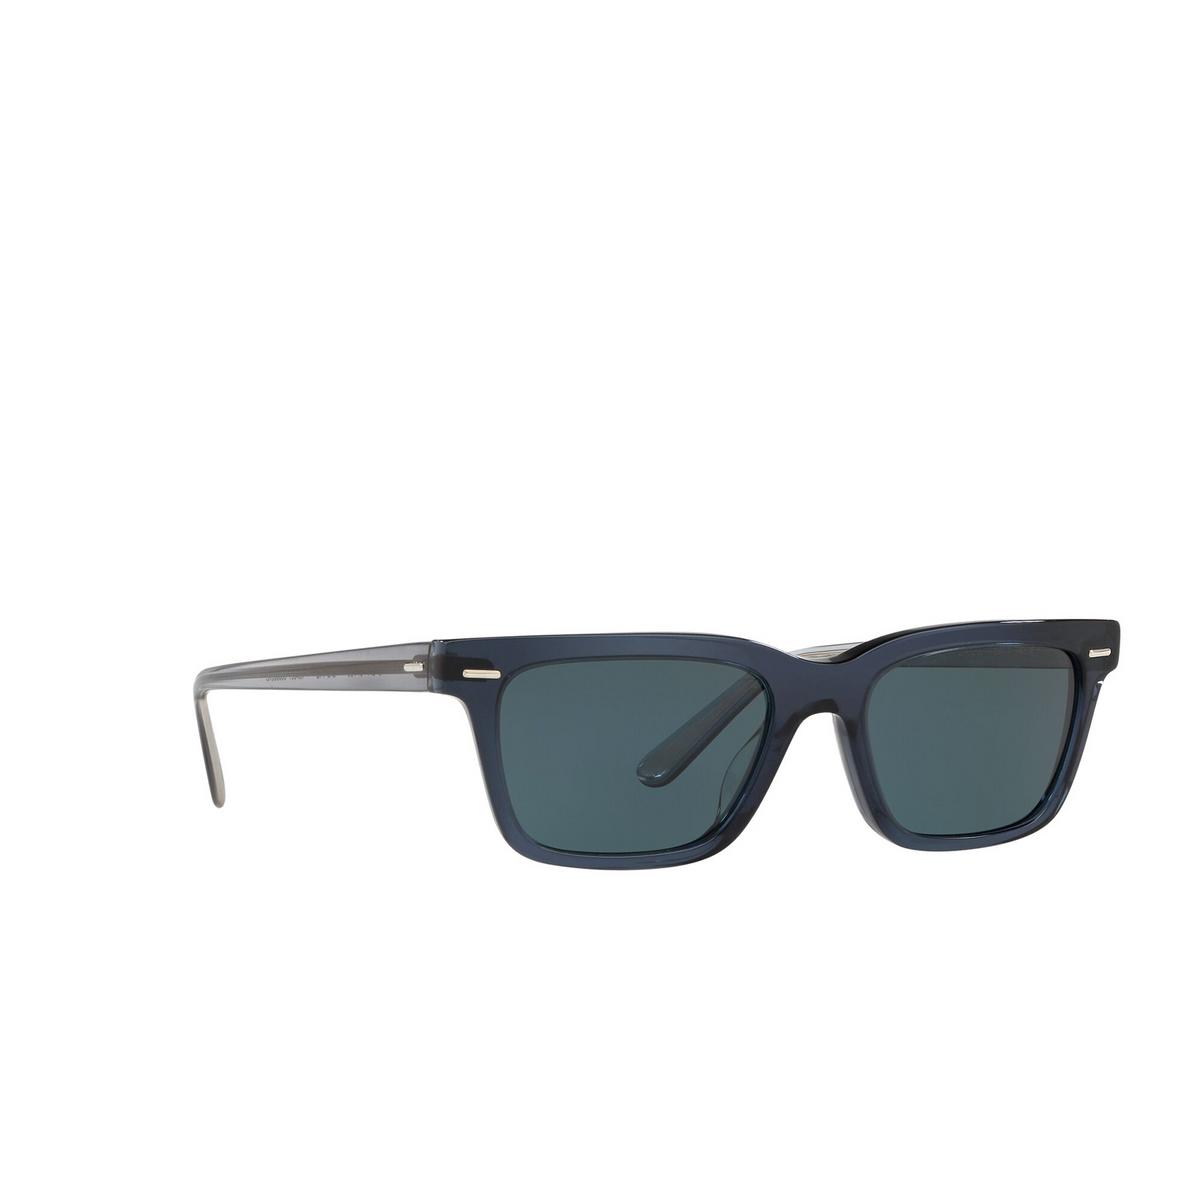 Oliver Peoples® Square Sunglasses: Ba Cc OV5388SU color Vivid Blue 16643R - three-quarters view.